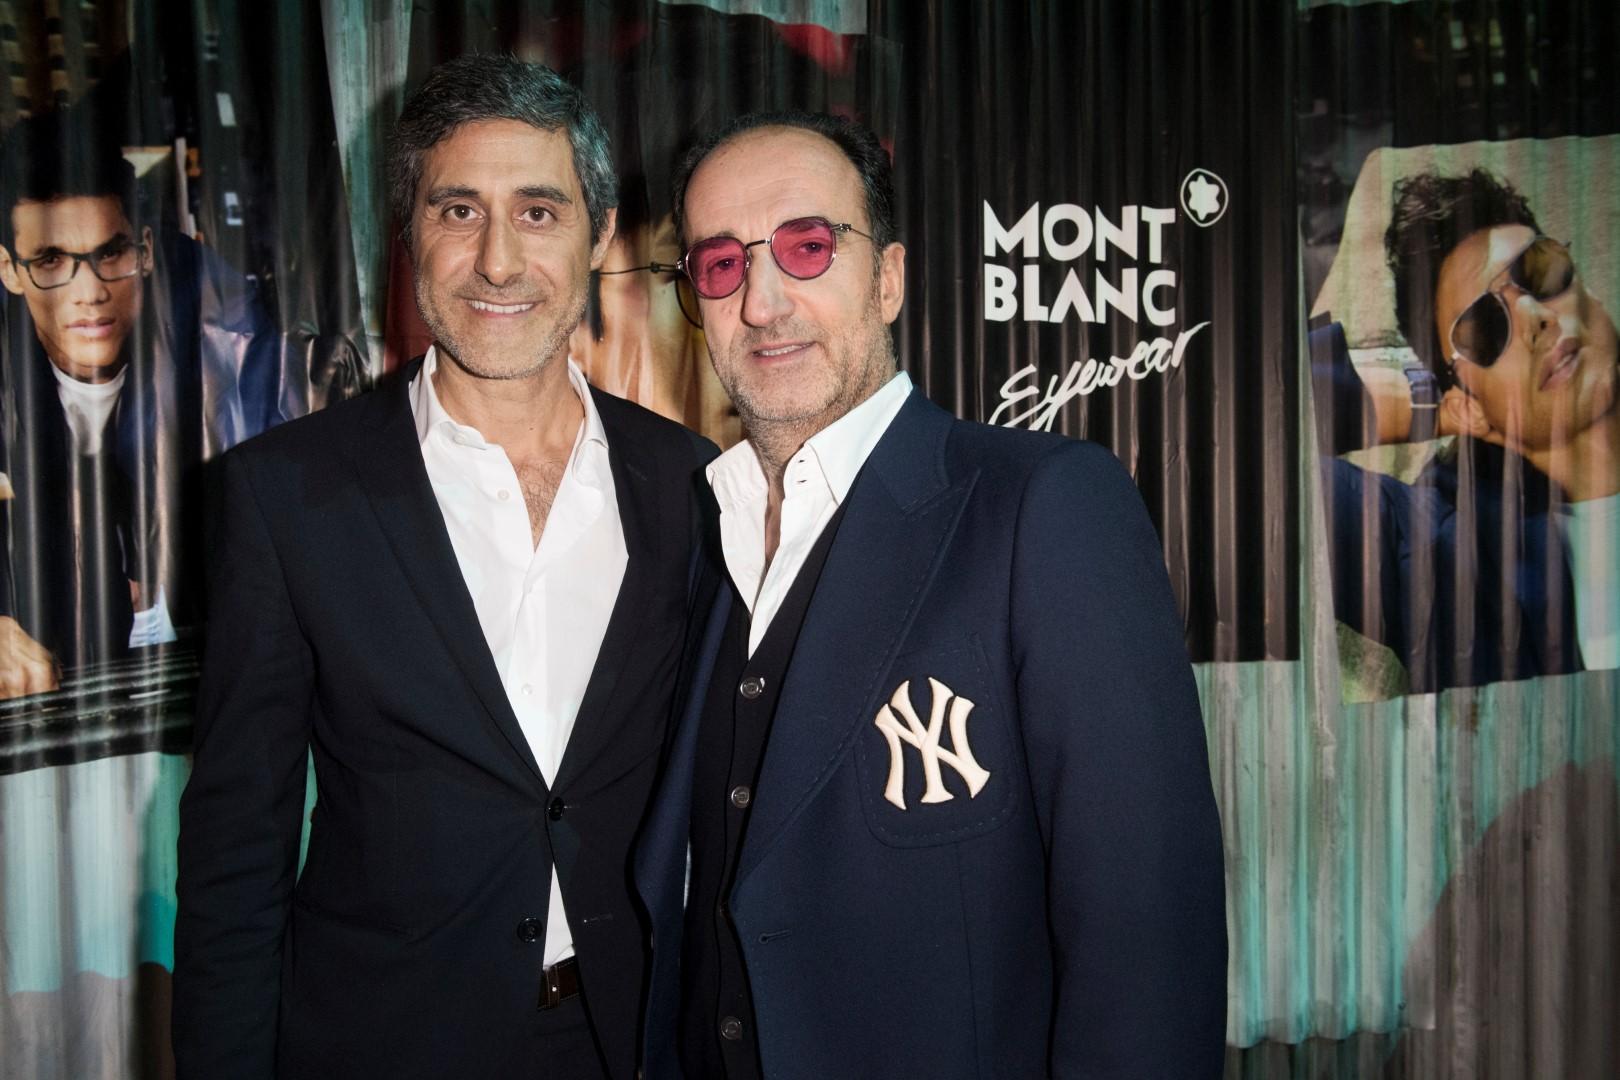 Montblanc occhiali da sole 2019